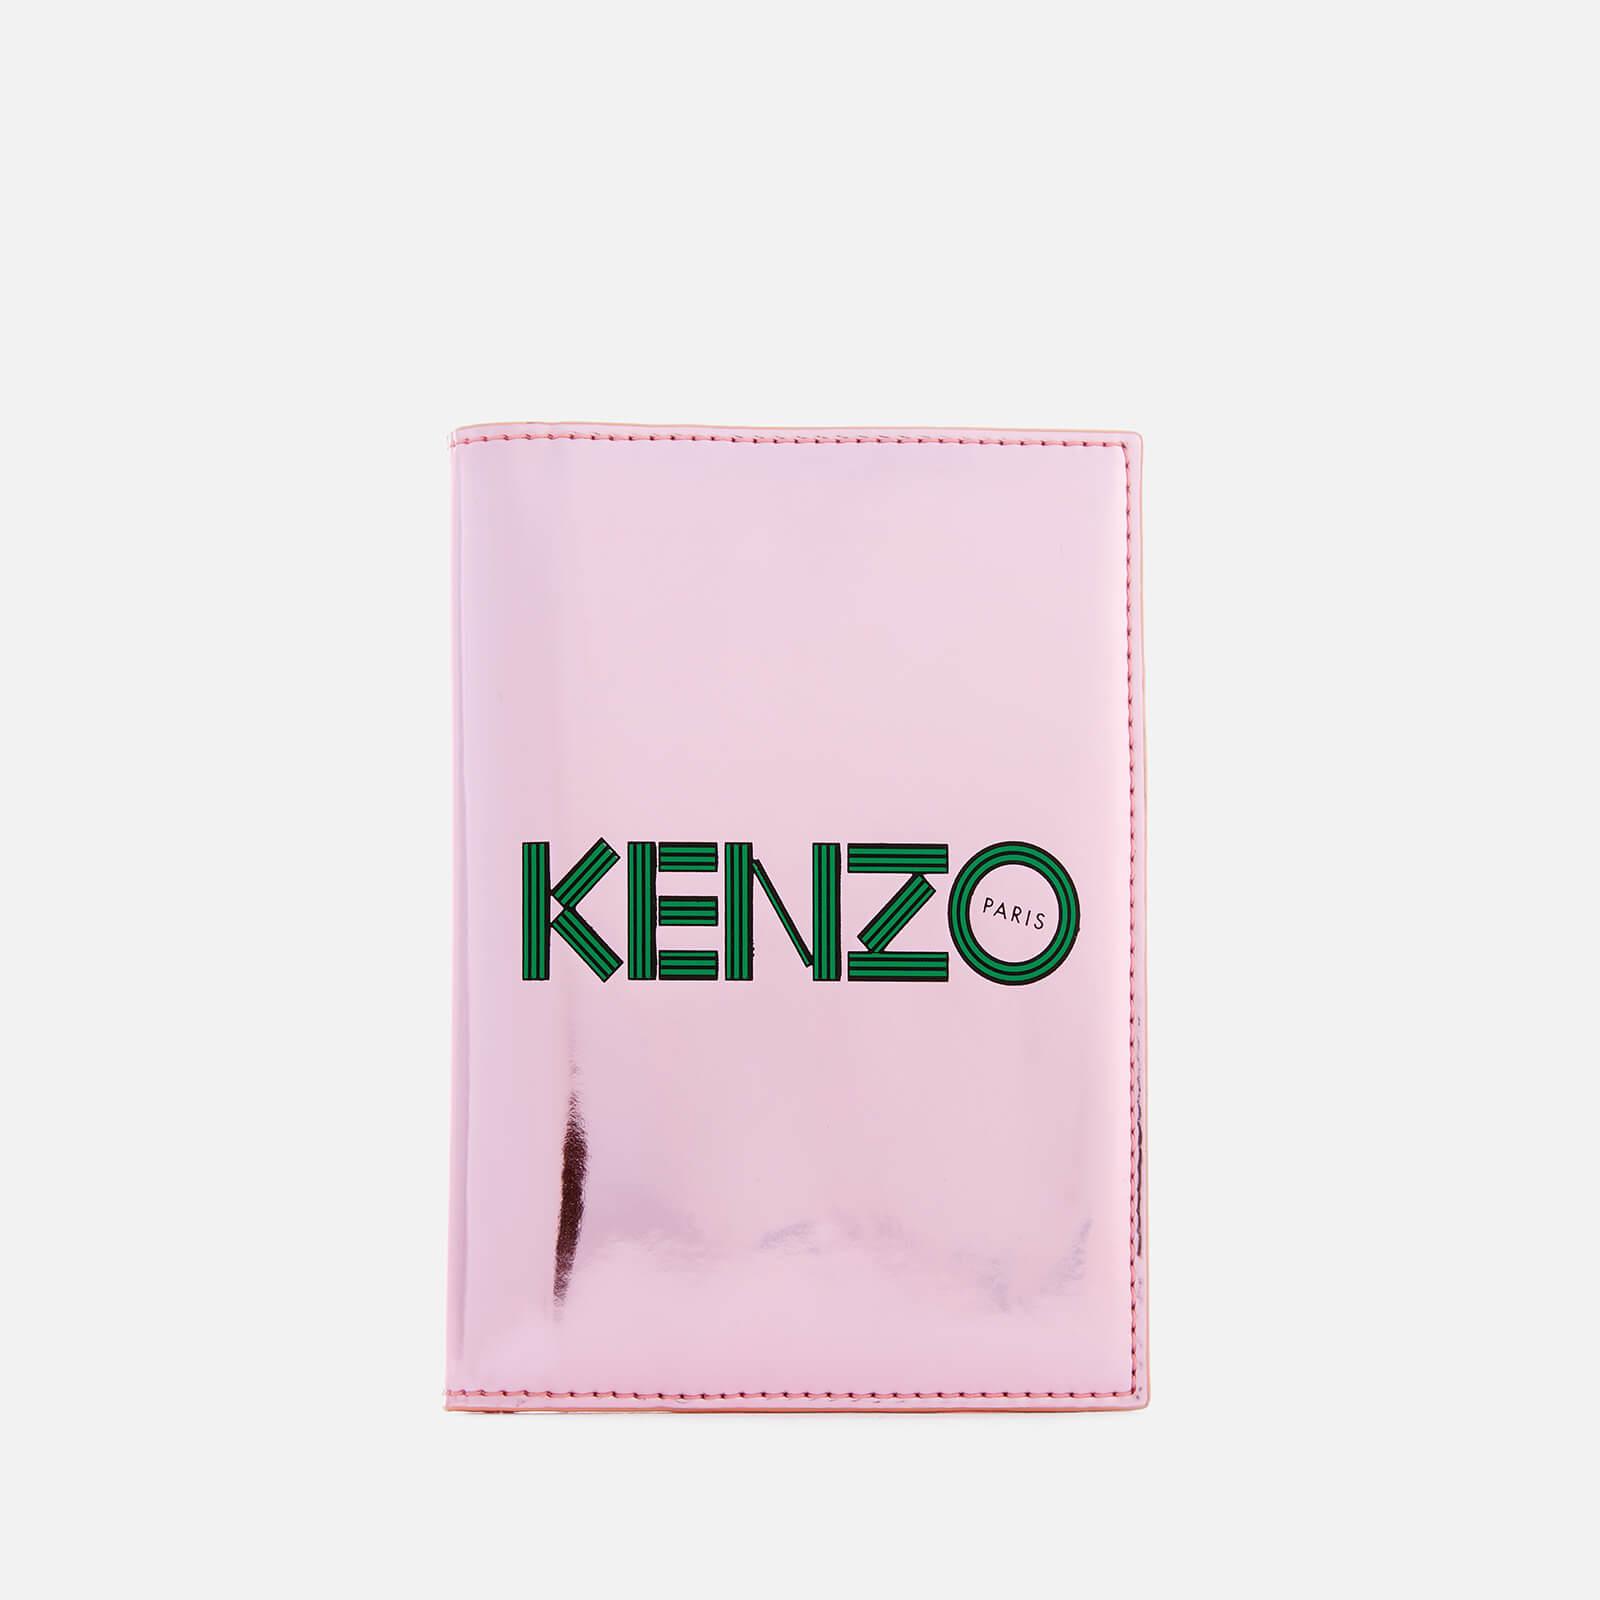 best loved 1b0f9 67103 KENZO Women's Logo Passport Holder - Faded Pink